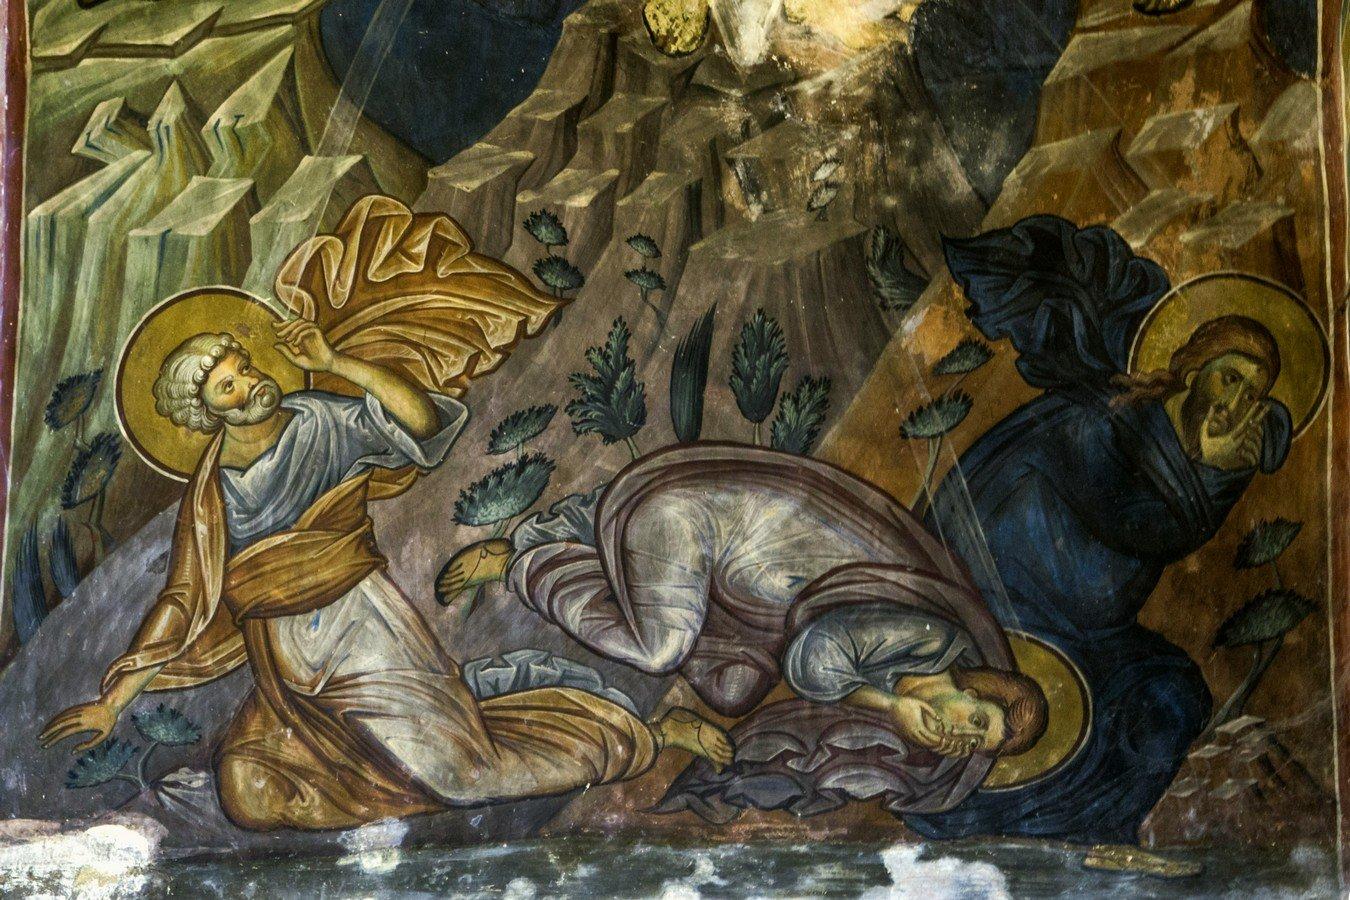 Преображение Господне. Фреска храма Святого Саввы монастыря Сапара, Грузия. Начало XIV века. Фрагмент.